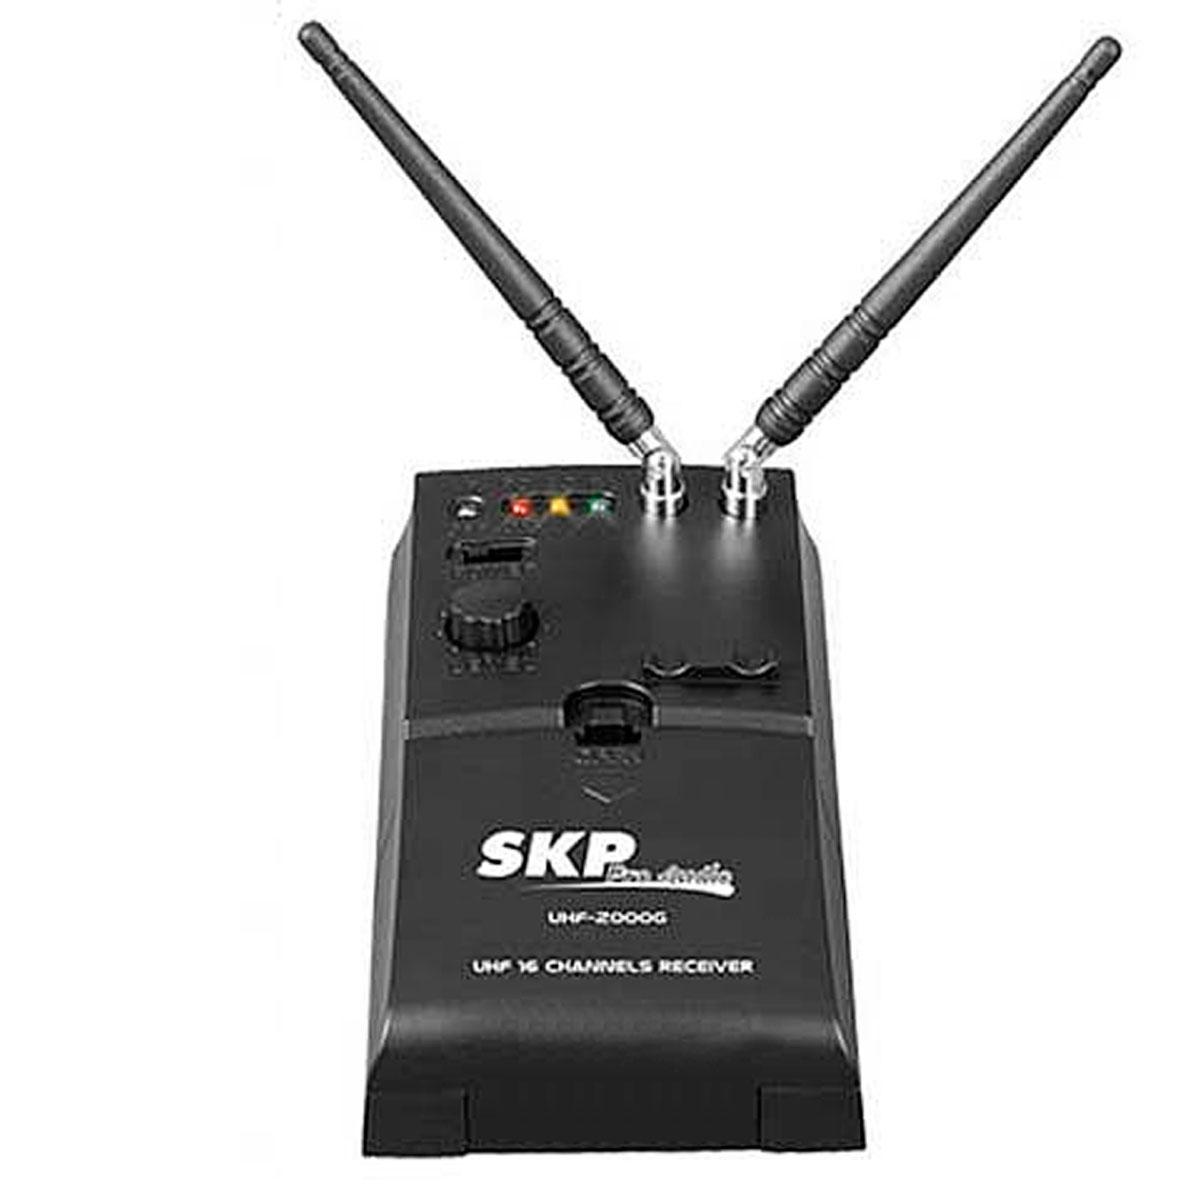 UHF4000S - Microfone s/ Fio p/ Instrumento UHF 4000 S - SKP